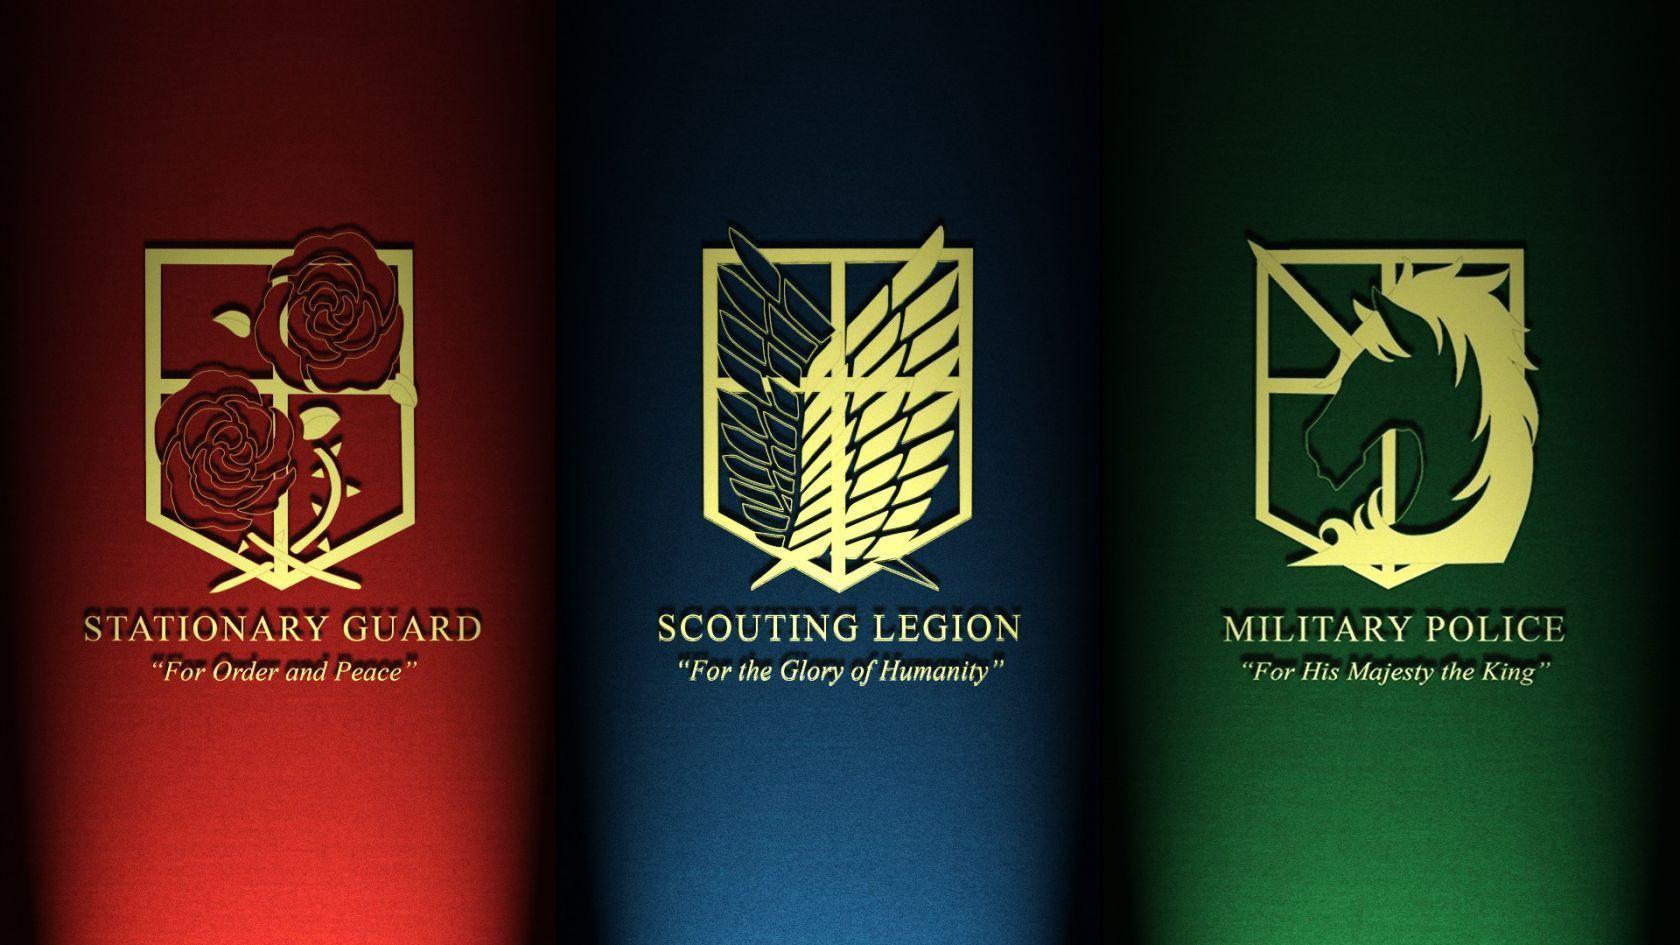 8515 - ¿A qué escuadrón militar pertenecerías?